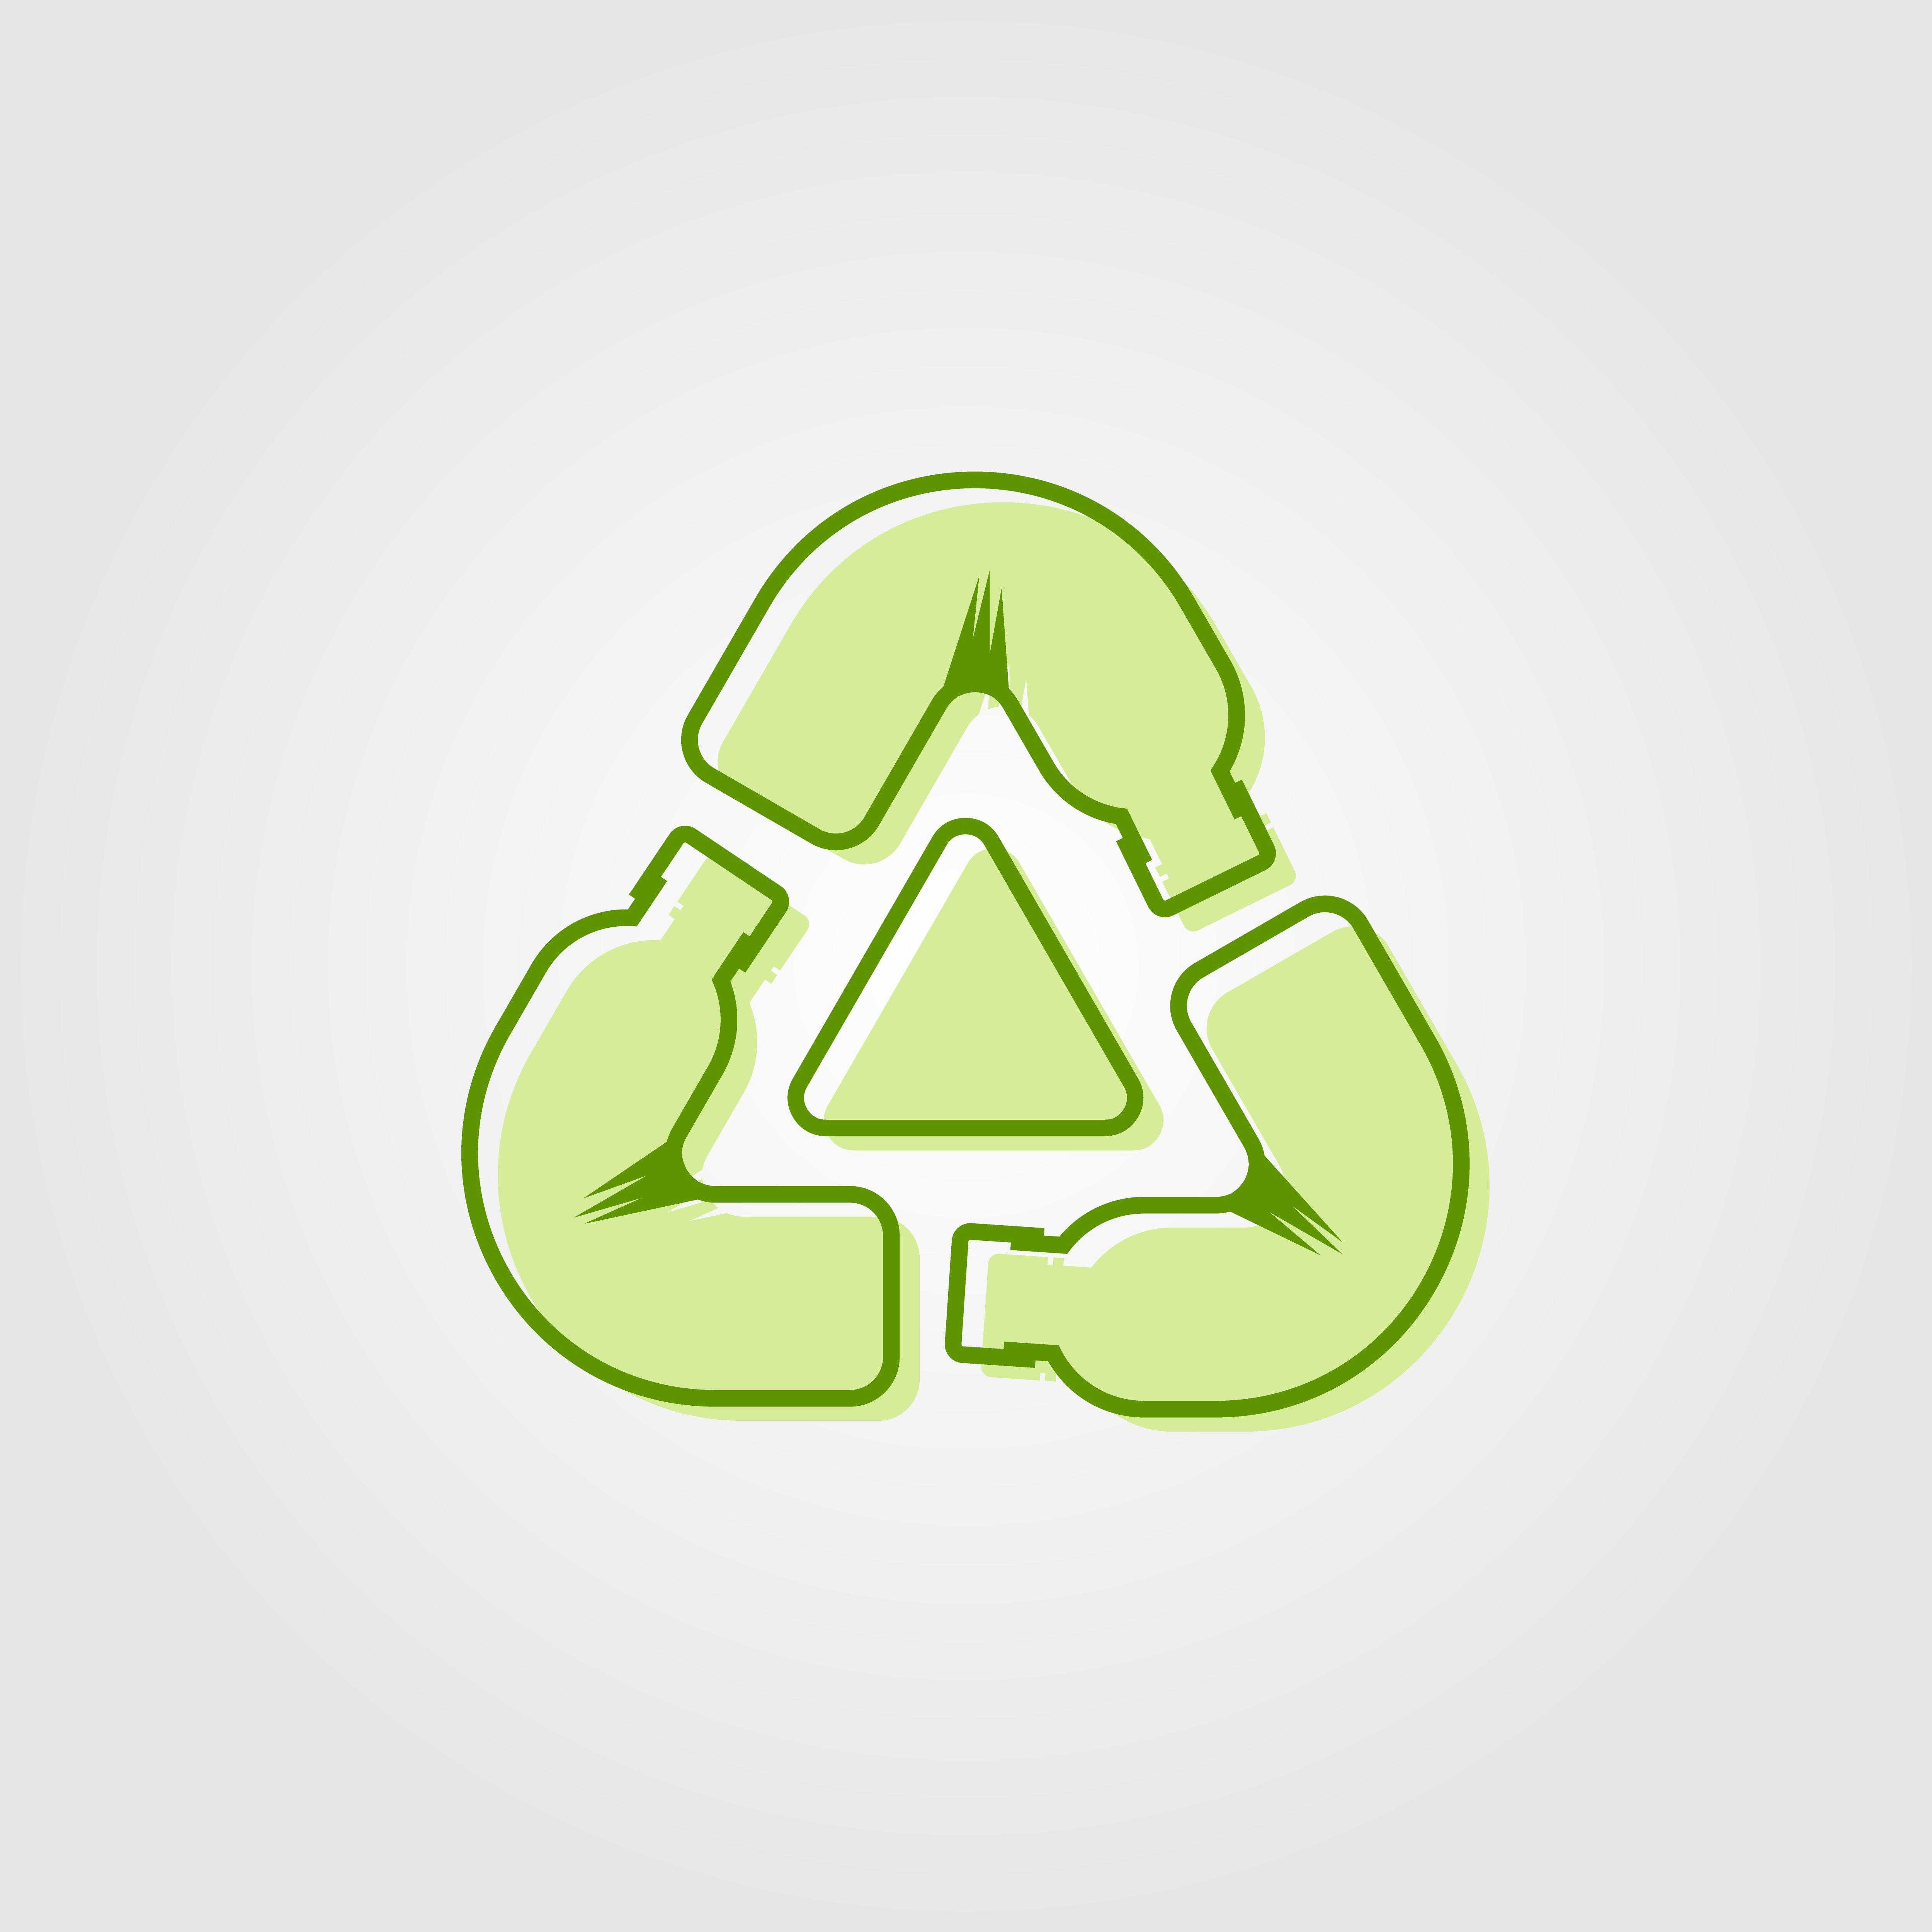 Recycle Plastic Bottle Logo Icon Vector Line Outline Monoline Green Color By Linimasa Desain Logo Desain Tekstil